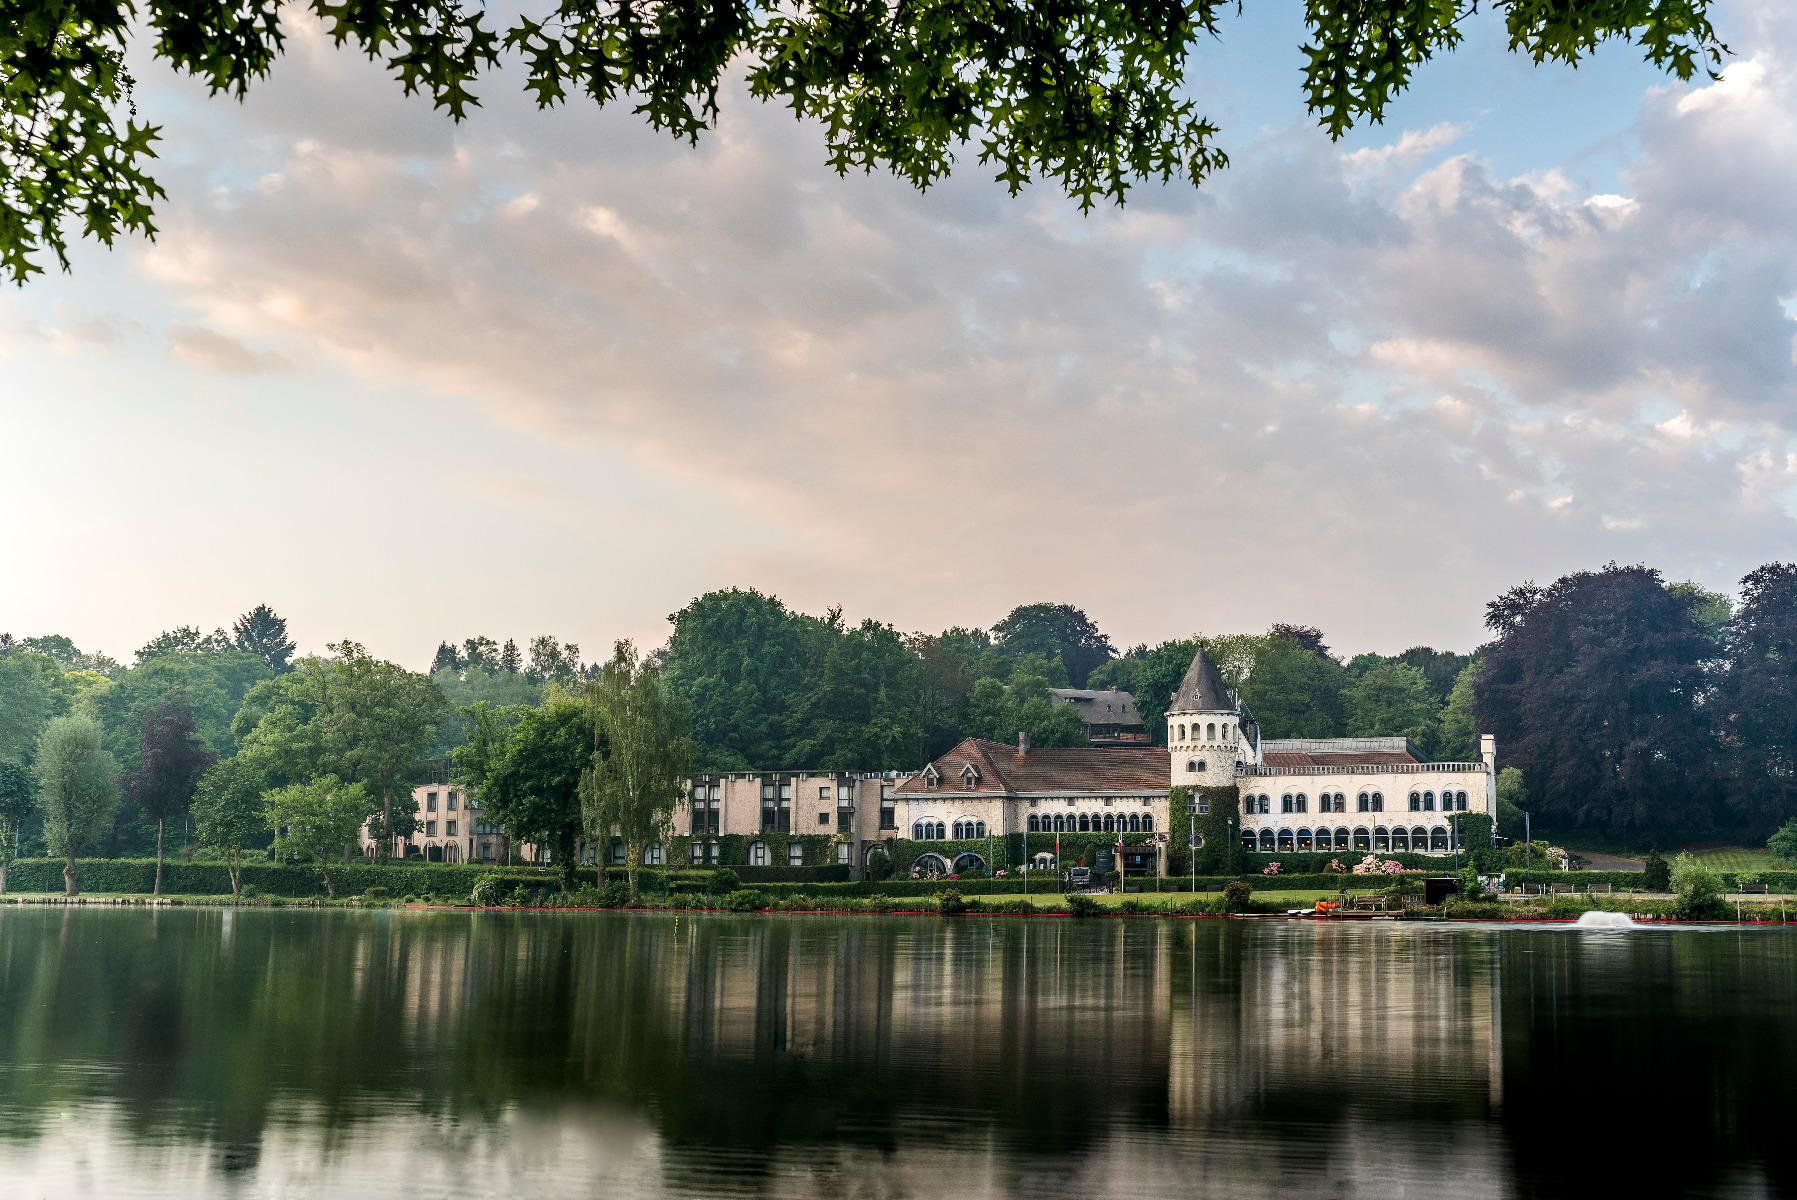 Golf-reizen-Golf-Expedition-België-Regio-Brussel-Martins-Chateau-du-Lac-lake-view